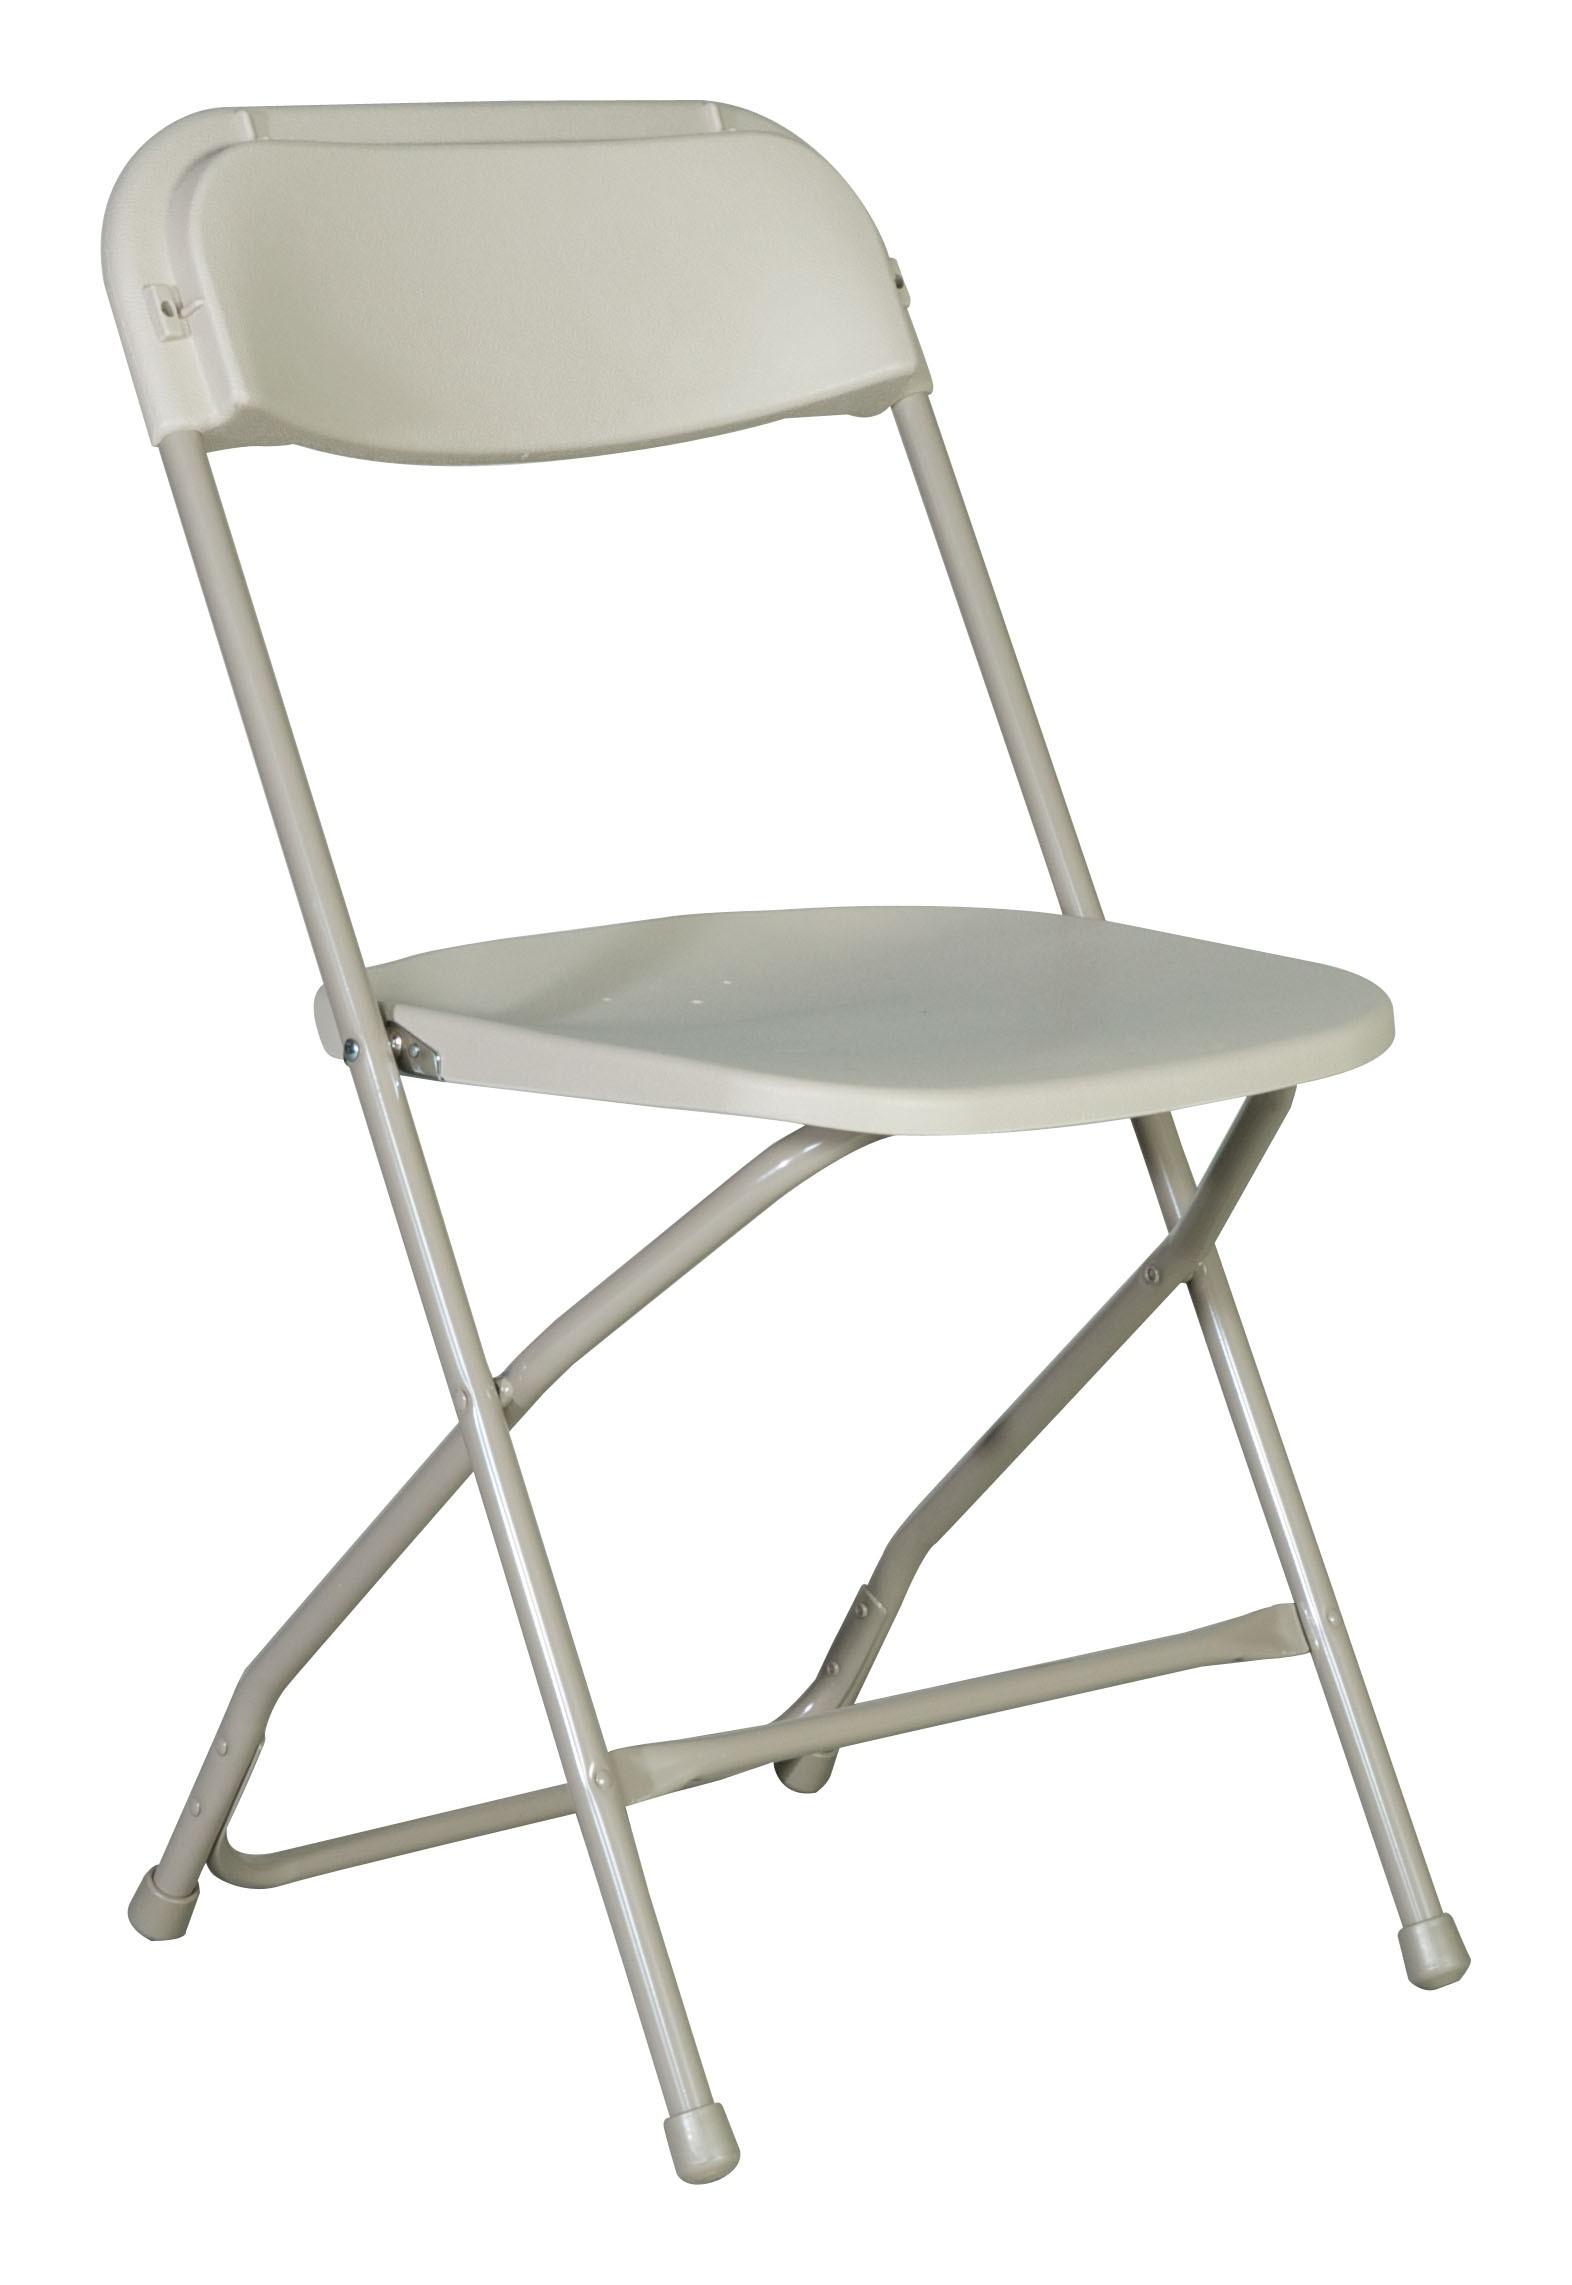 OffWhite Folding Chair  Roland L Appleton Inc